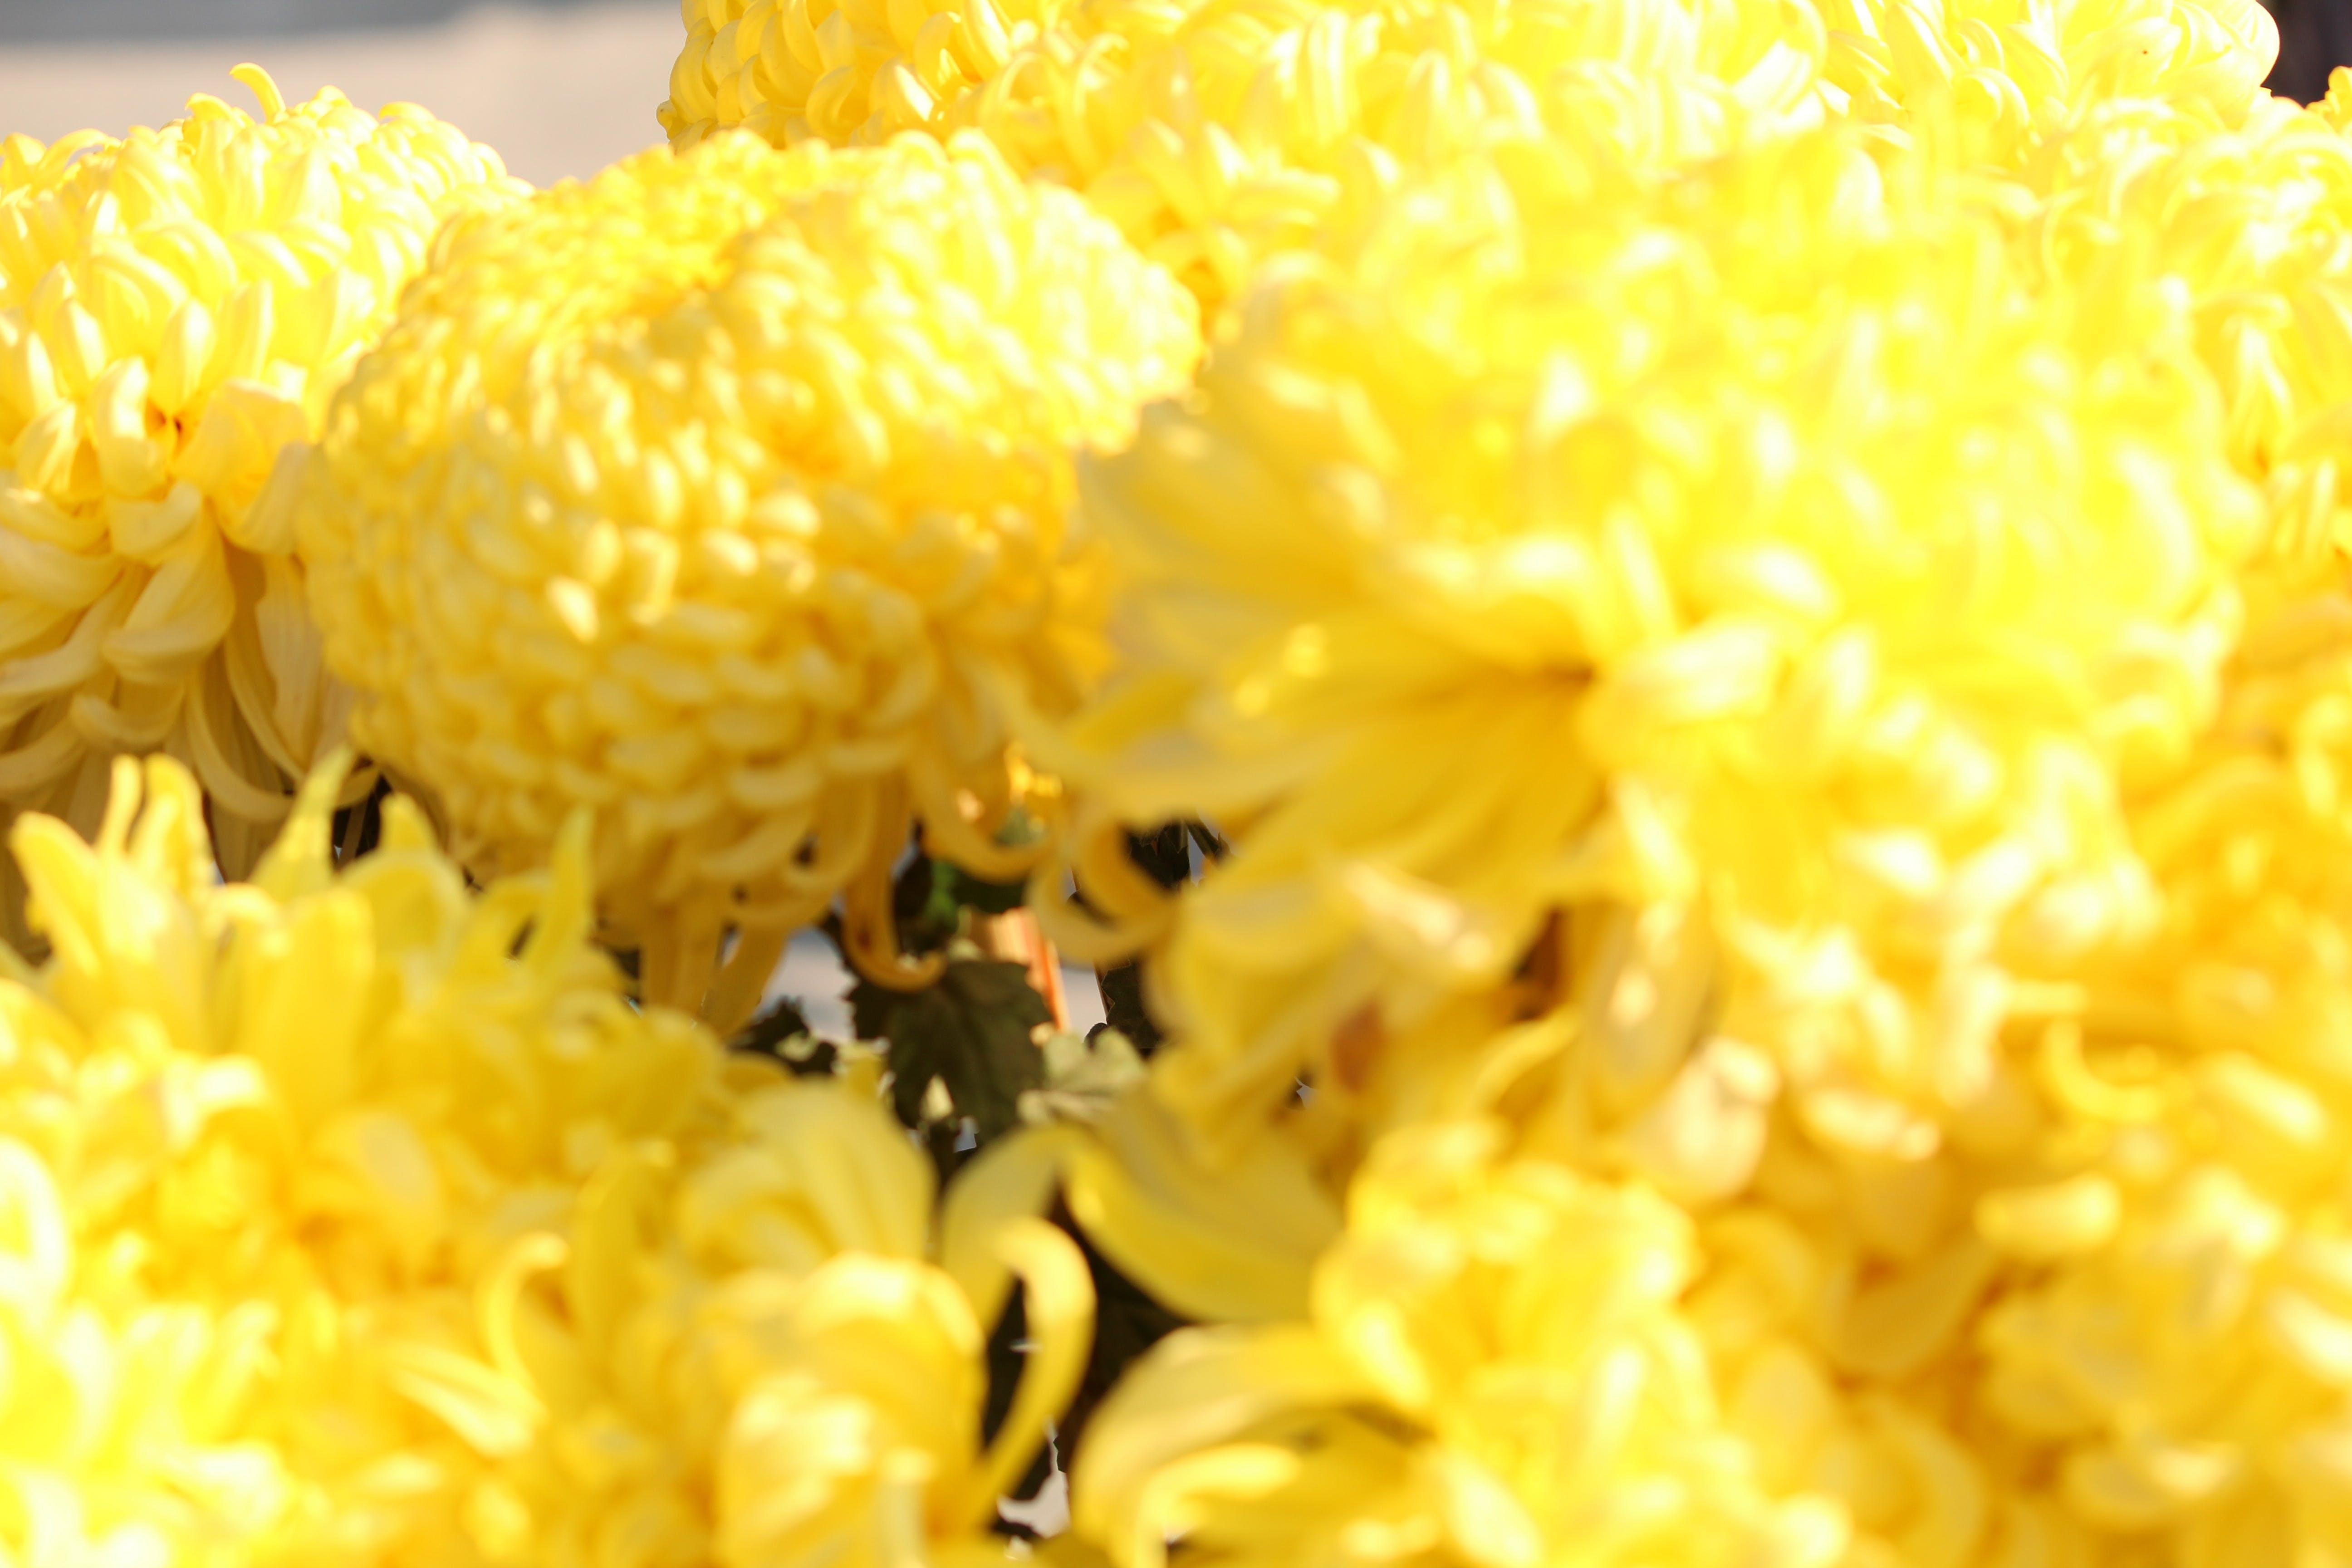 Free stock photo of flowers, yellow flowers